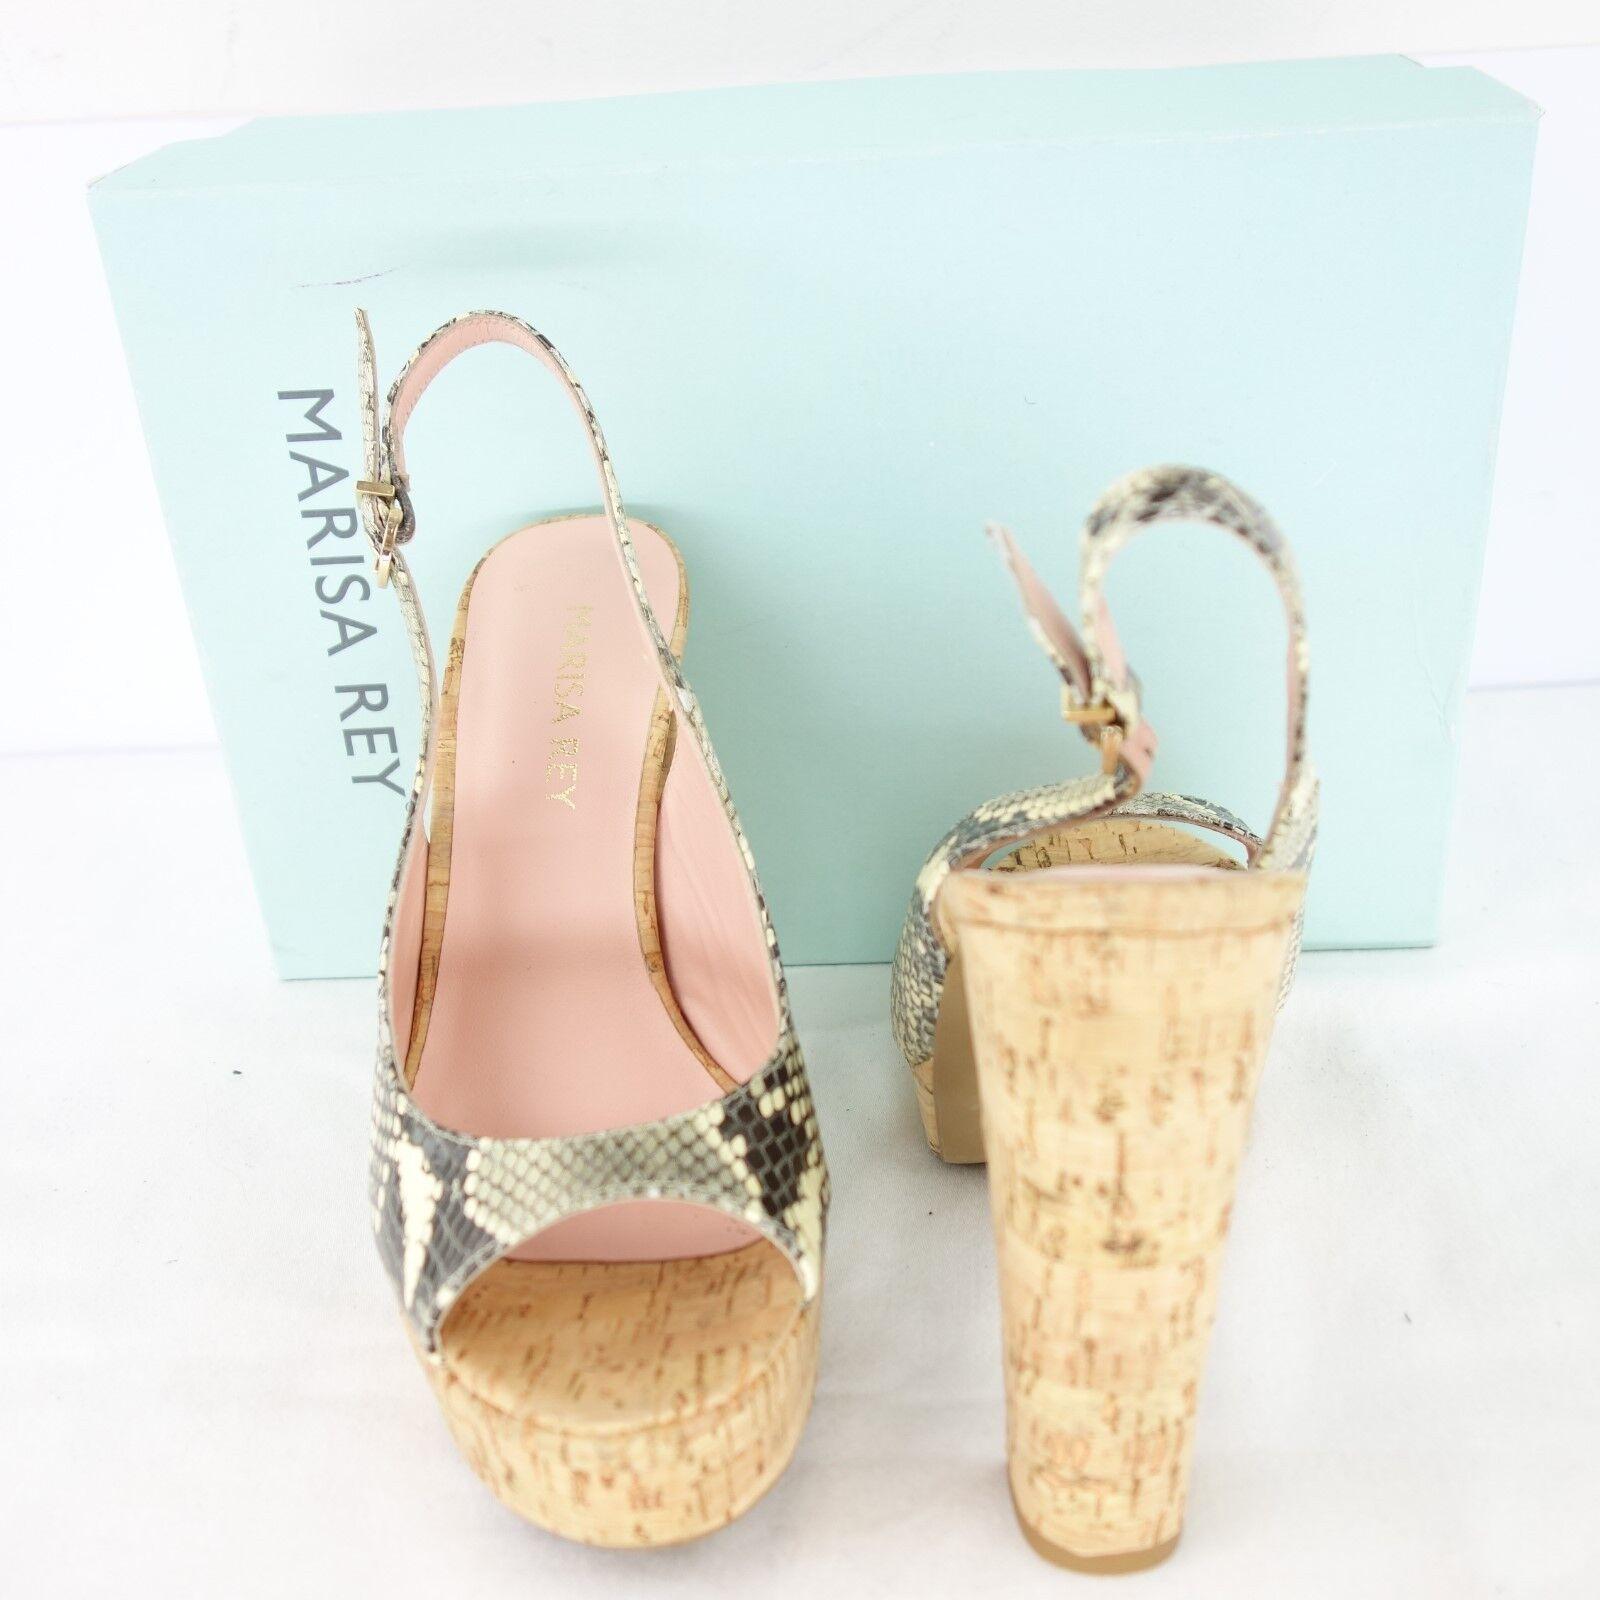 Marisa Rey Rey Rey Women Plateau High-Heeled Sandals Pumps Sz. 40 41 Leather 45e9d8